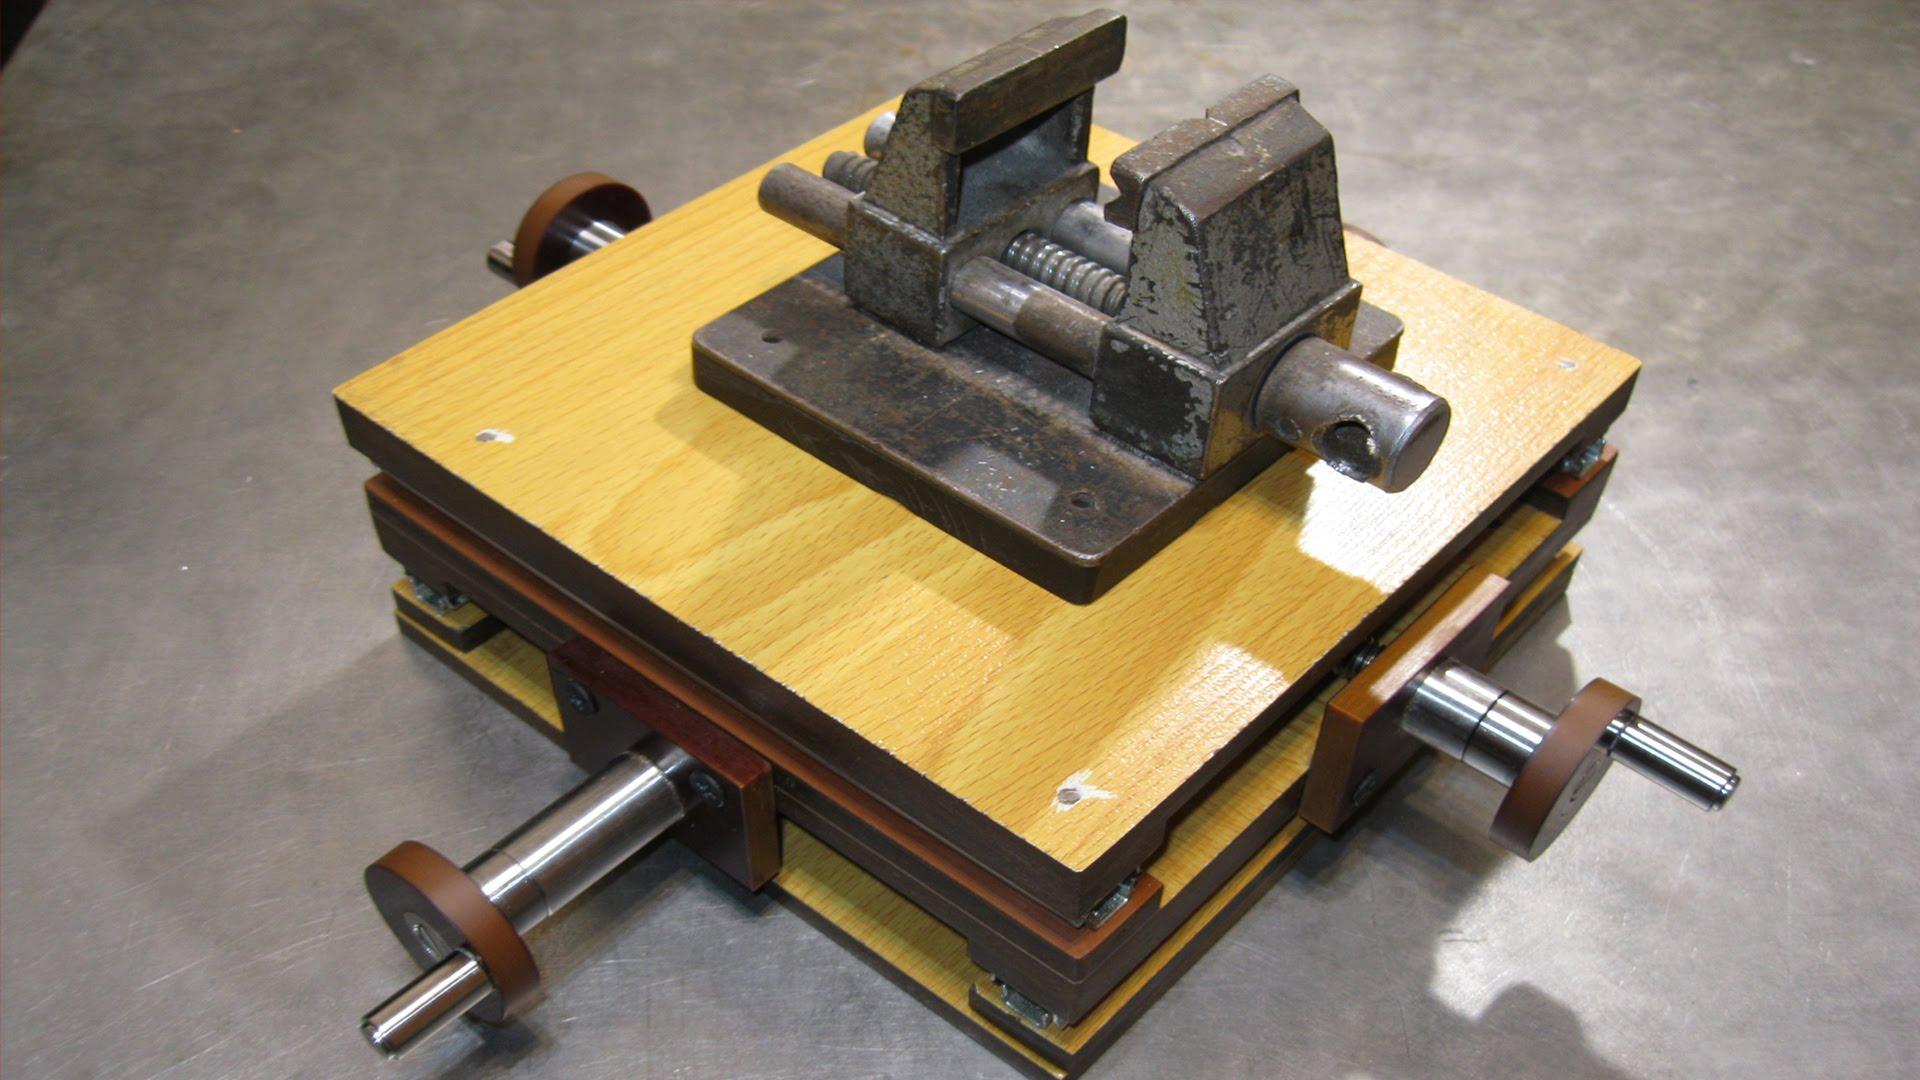 Стол для станков своими руками